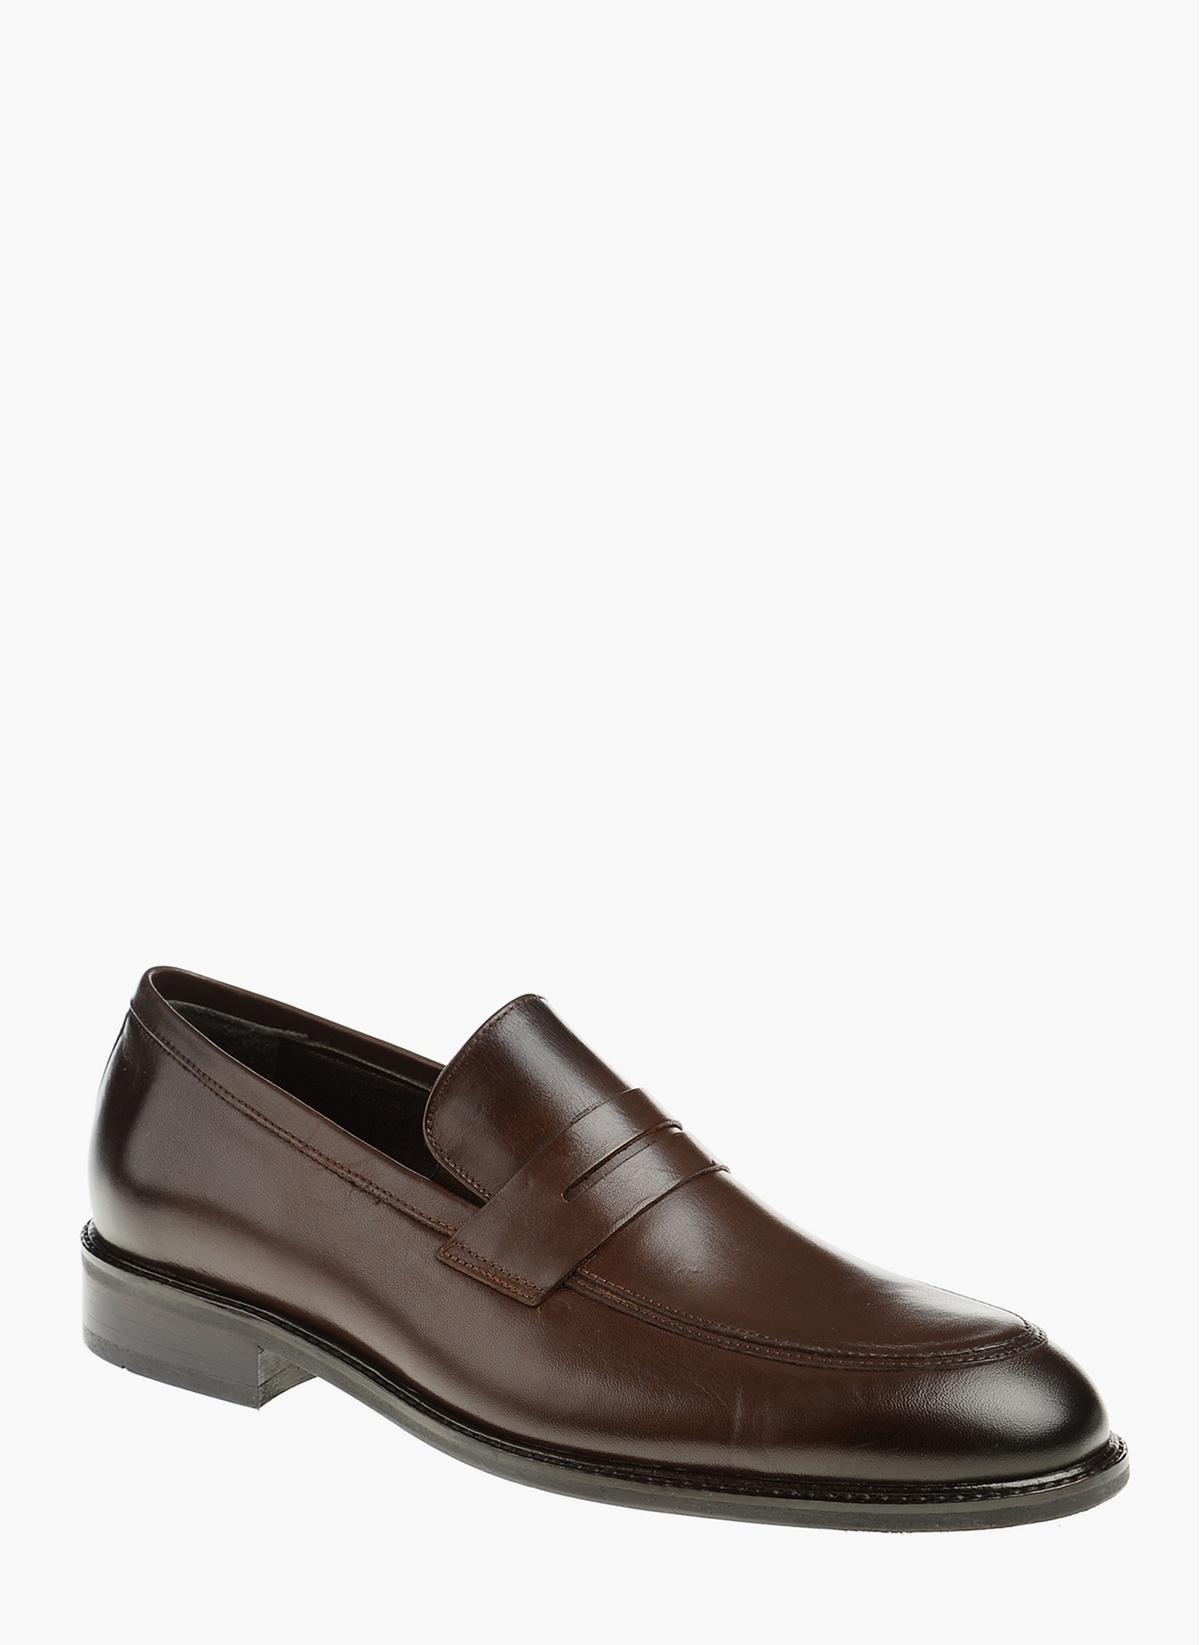 Divarese Ayakkabı 5022106 E Loafer – 399.0 TL